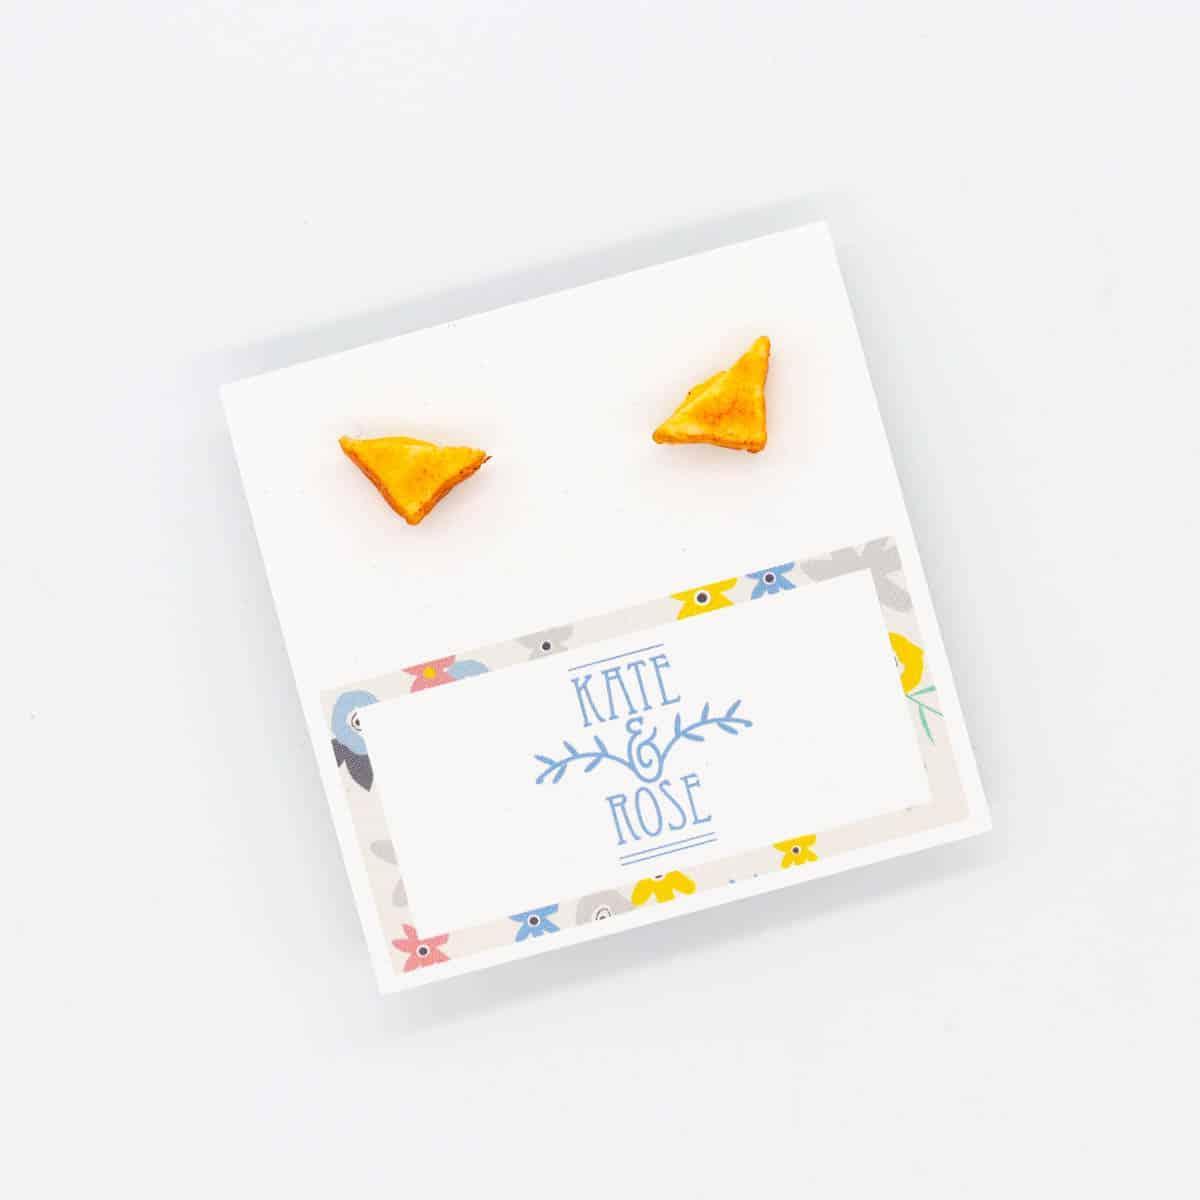 cheese-toastie-studs-earrings-by-kate-and-rose-prahran-912303-katenrosetea